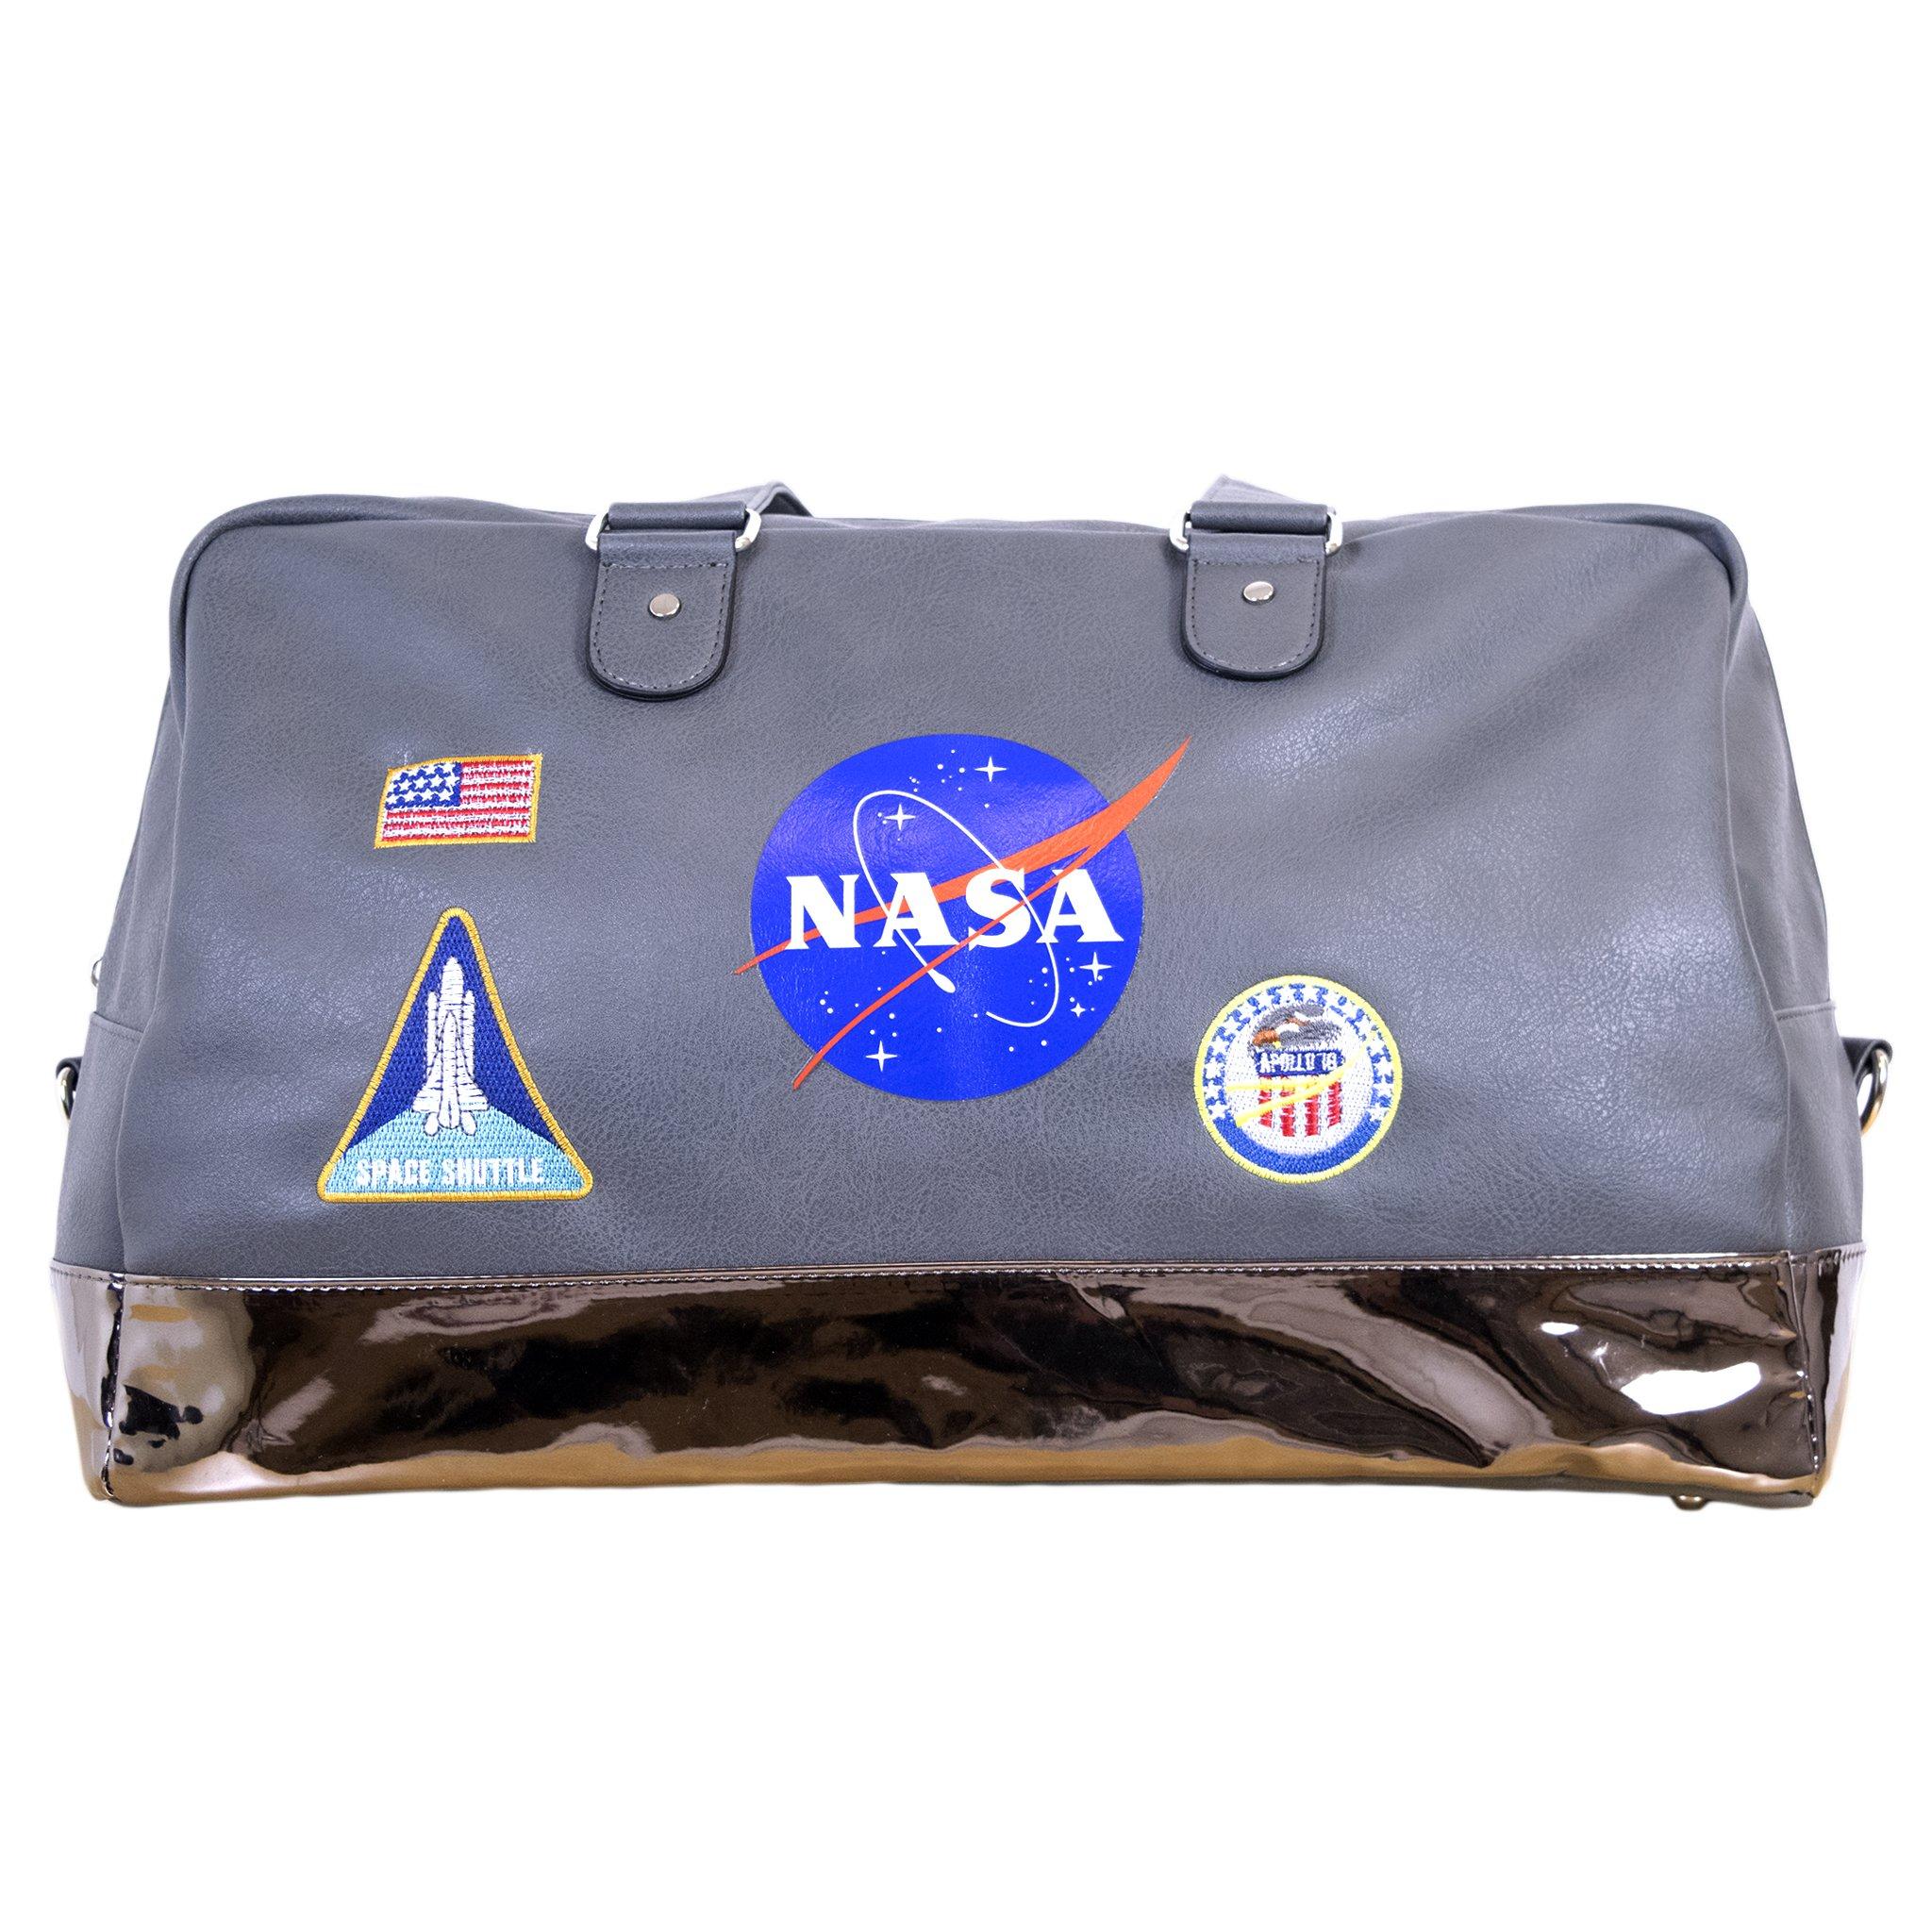 NASA Lifestyle Travel Gray Duffel Bag